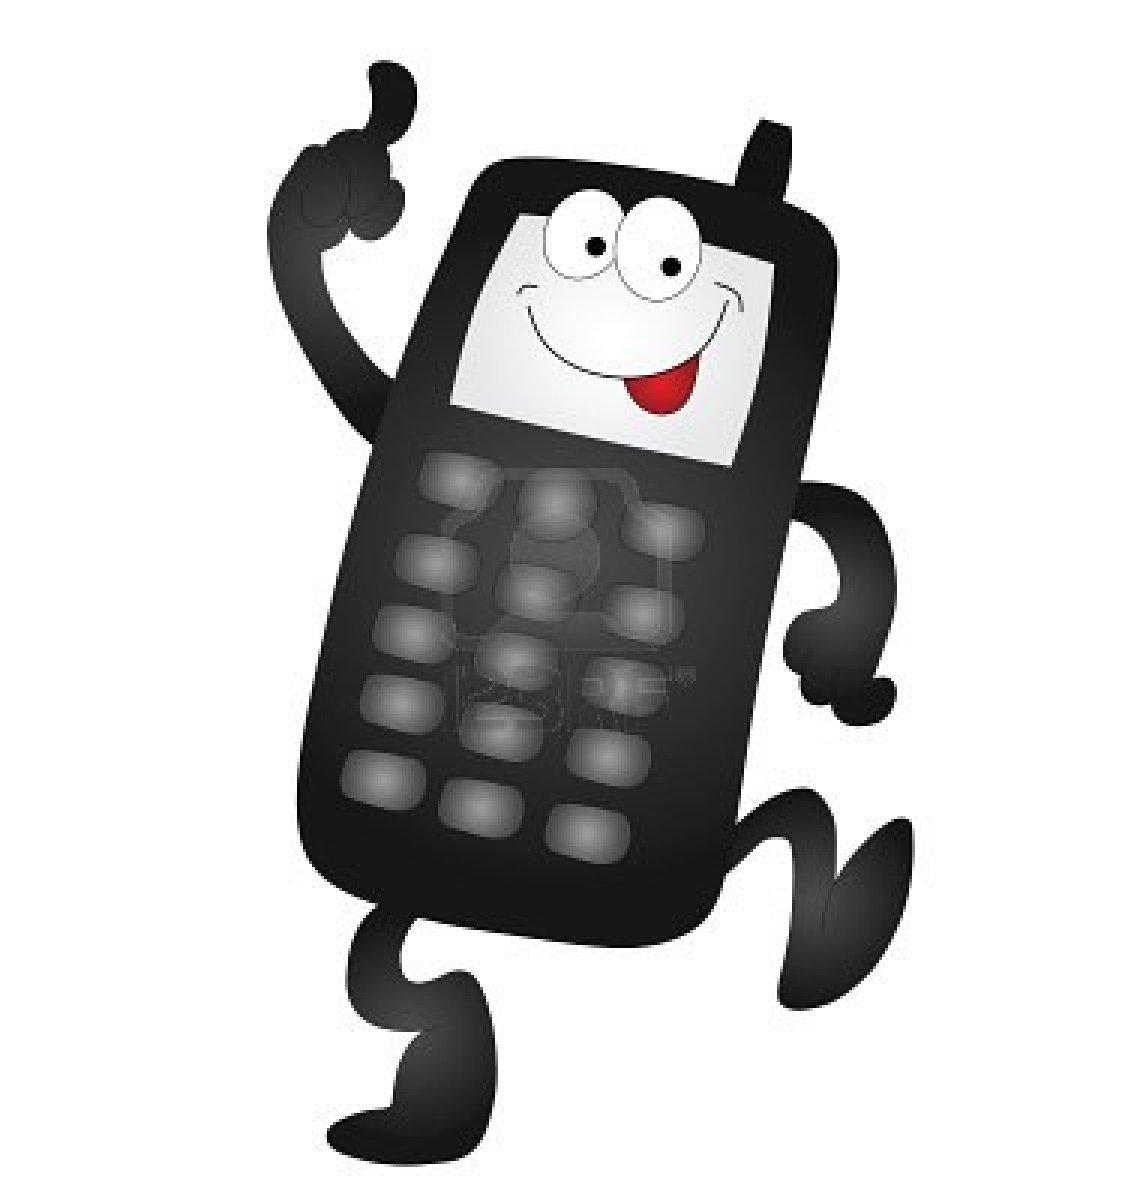 9931008 cartoon mobile phone isolated on white background